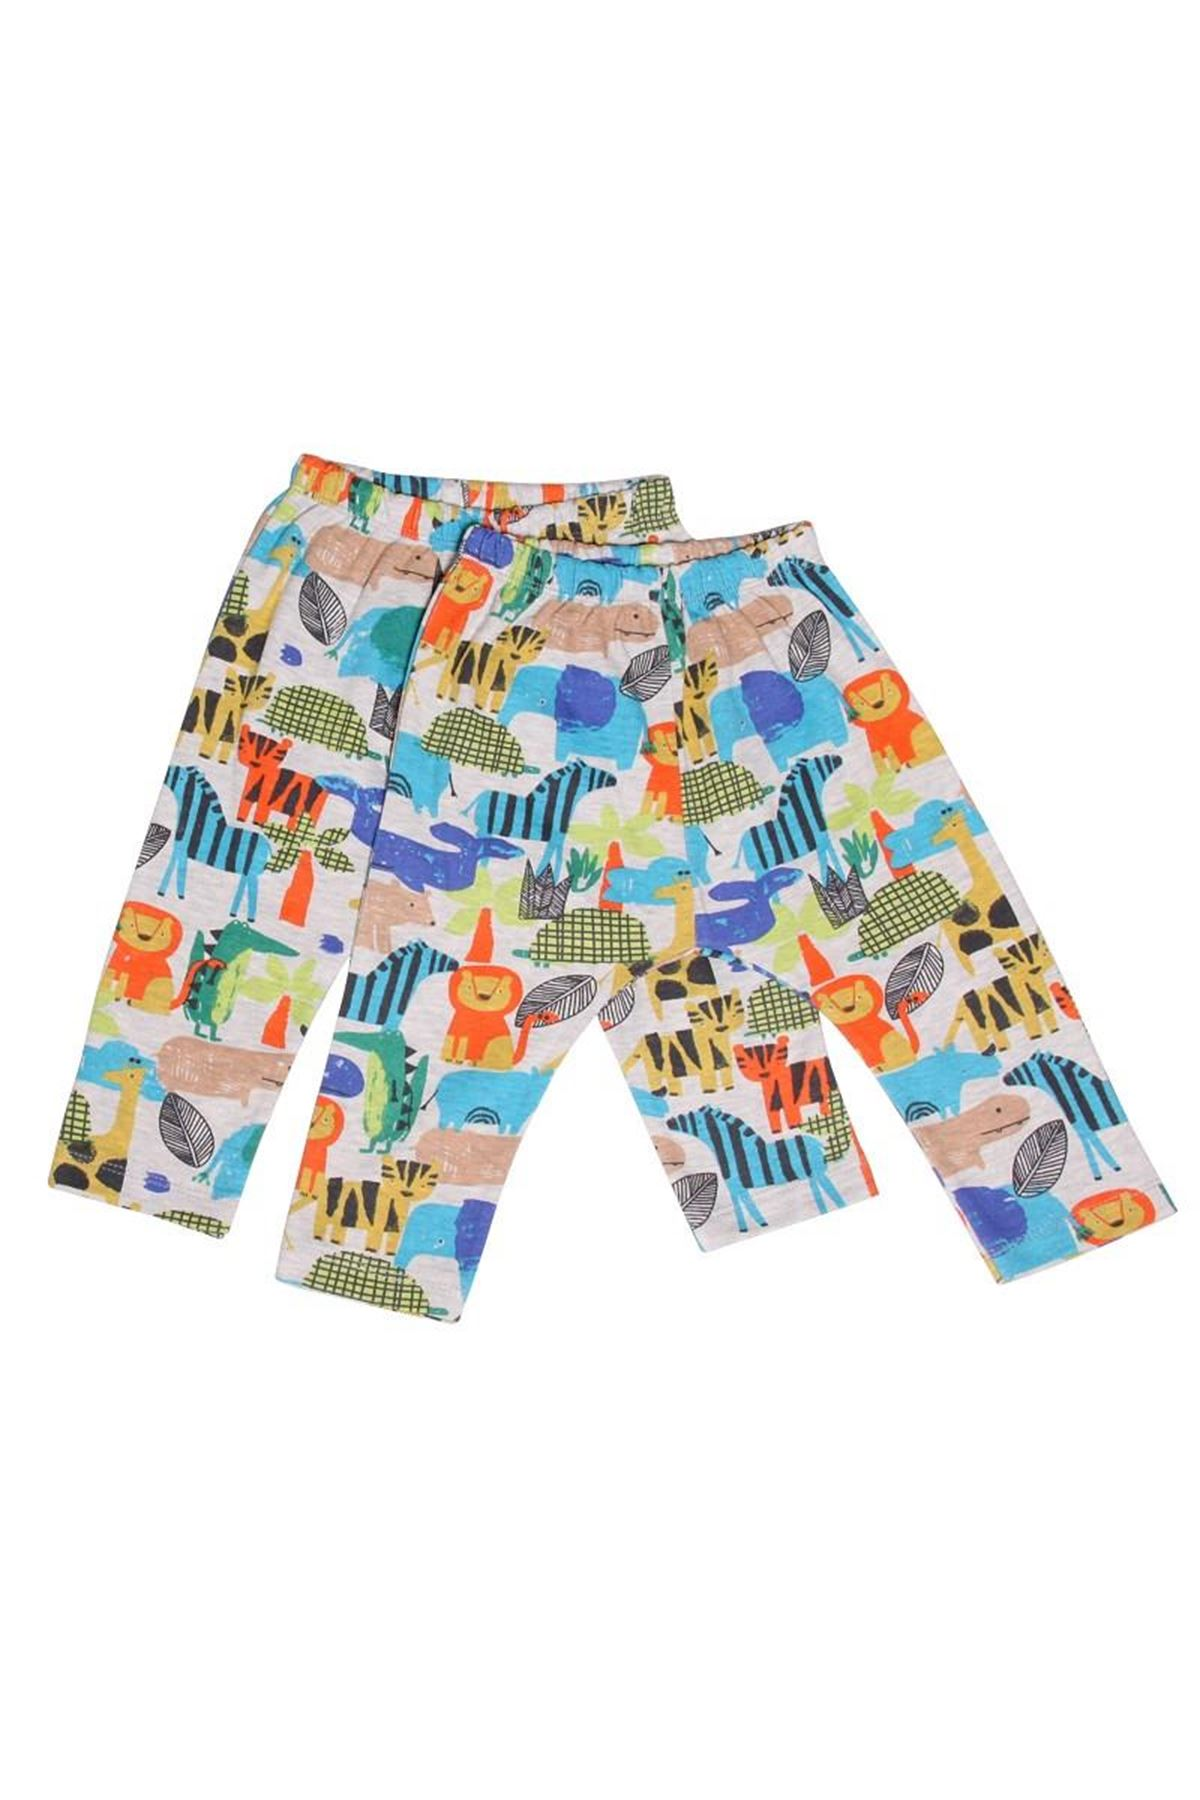 Luggi Baby Cute Animals 2li Bebek Pantolon LG-4578 Karışık Renkli